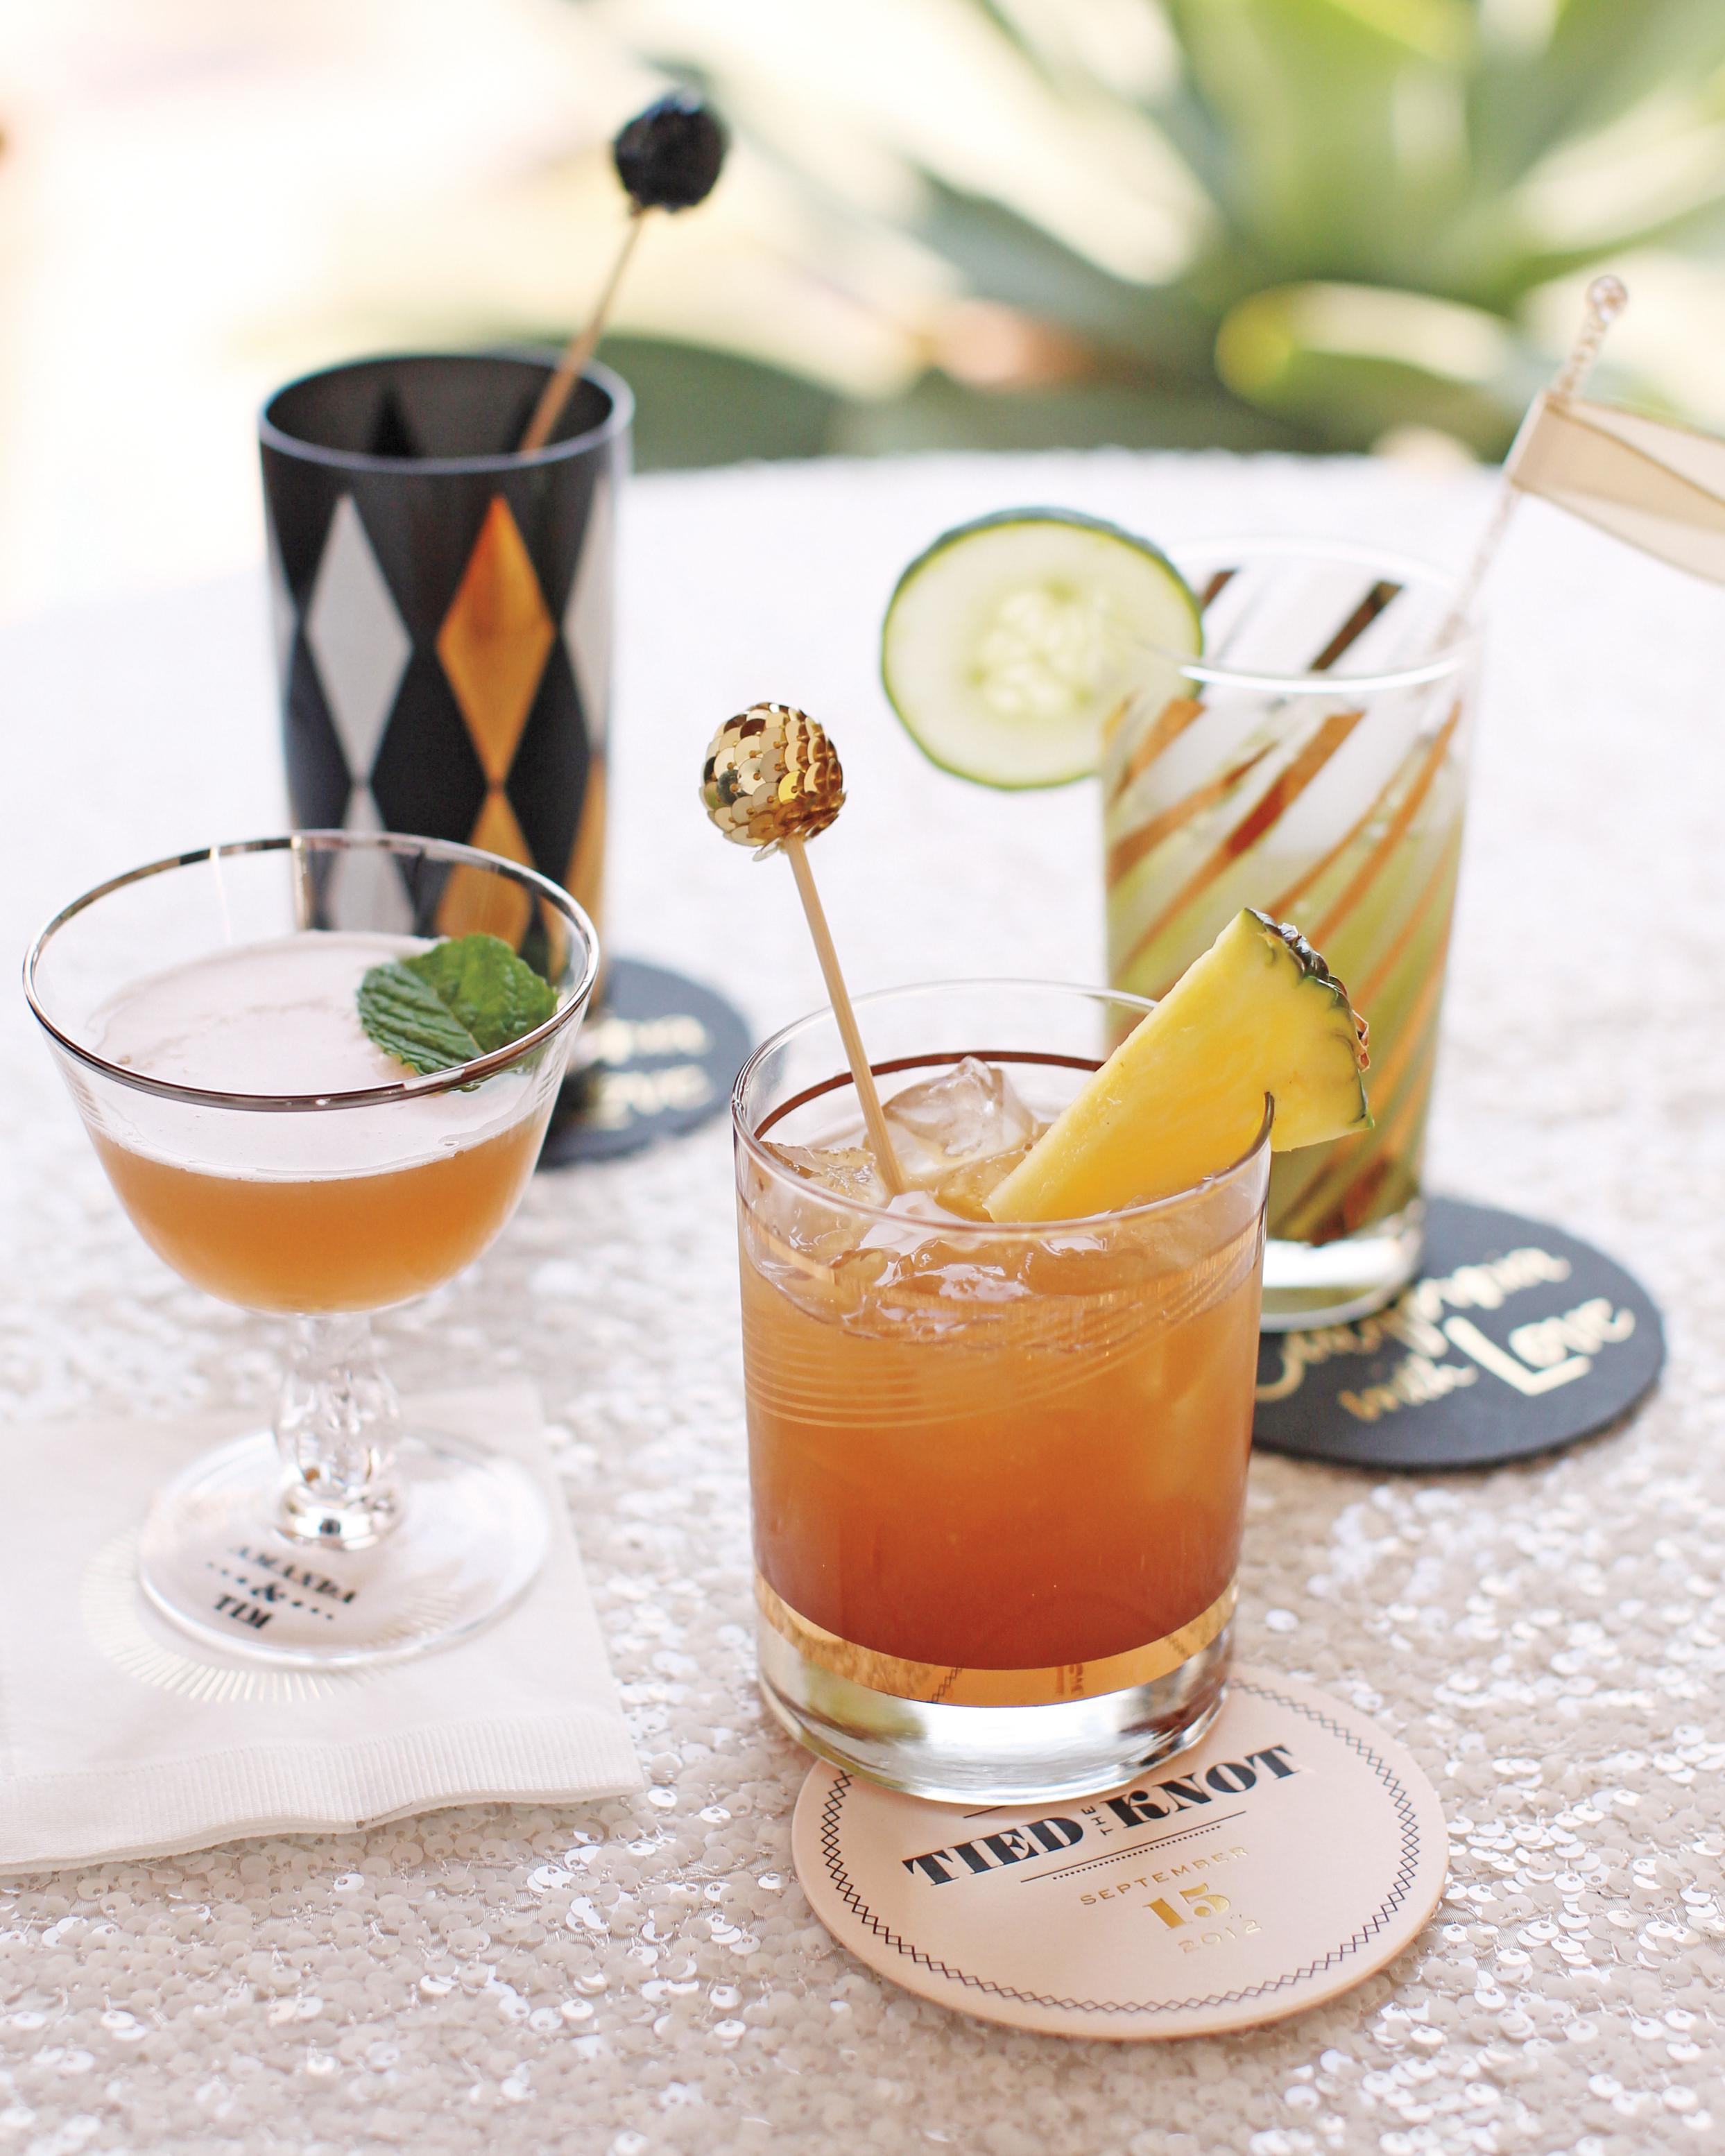 cocktail-setup-001-mwd109359.jpg